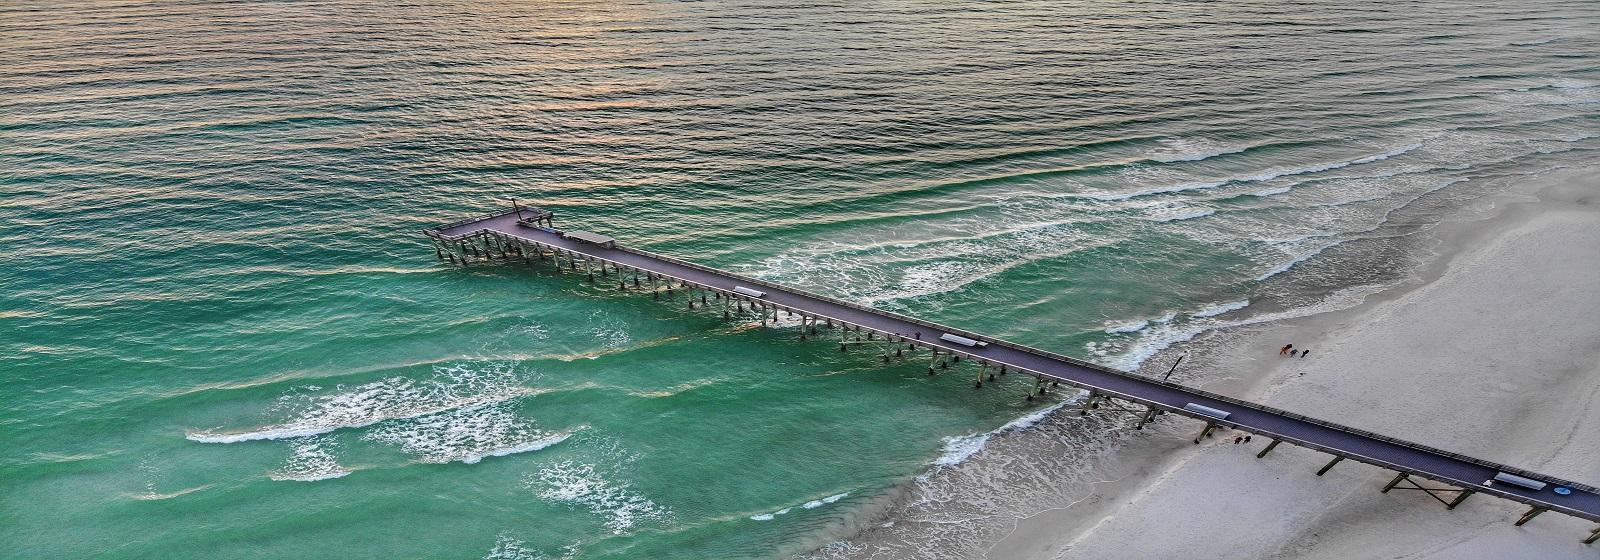 Things to do in Panama City Beach